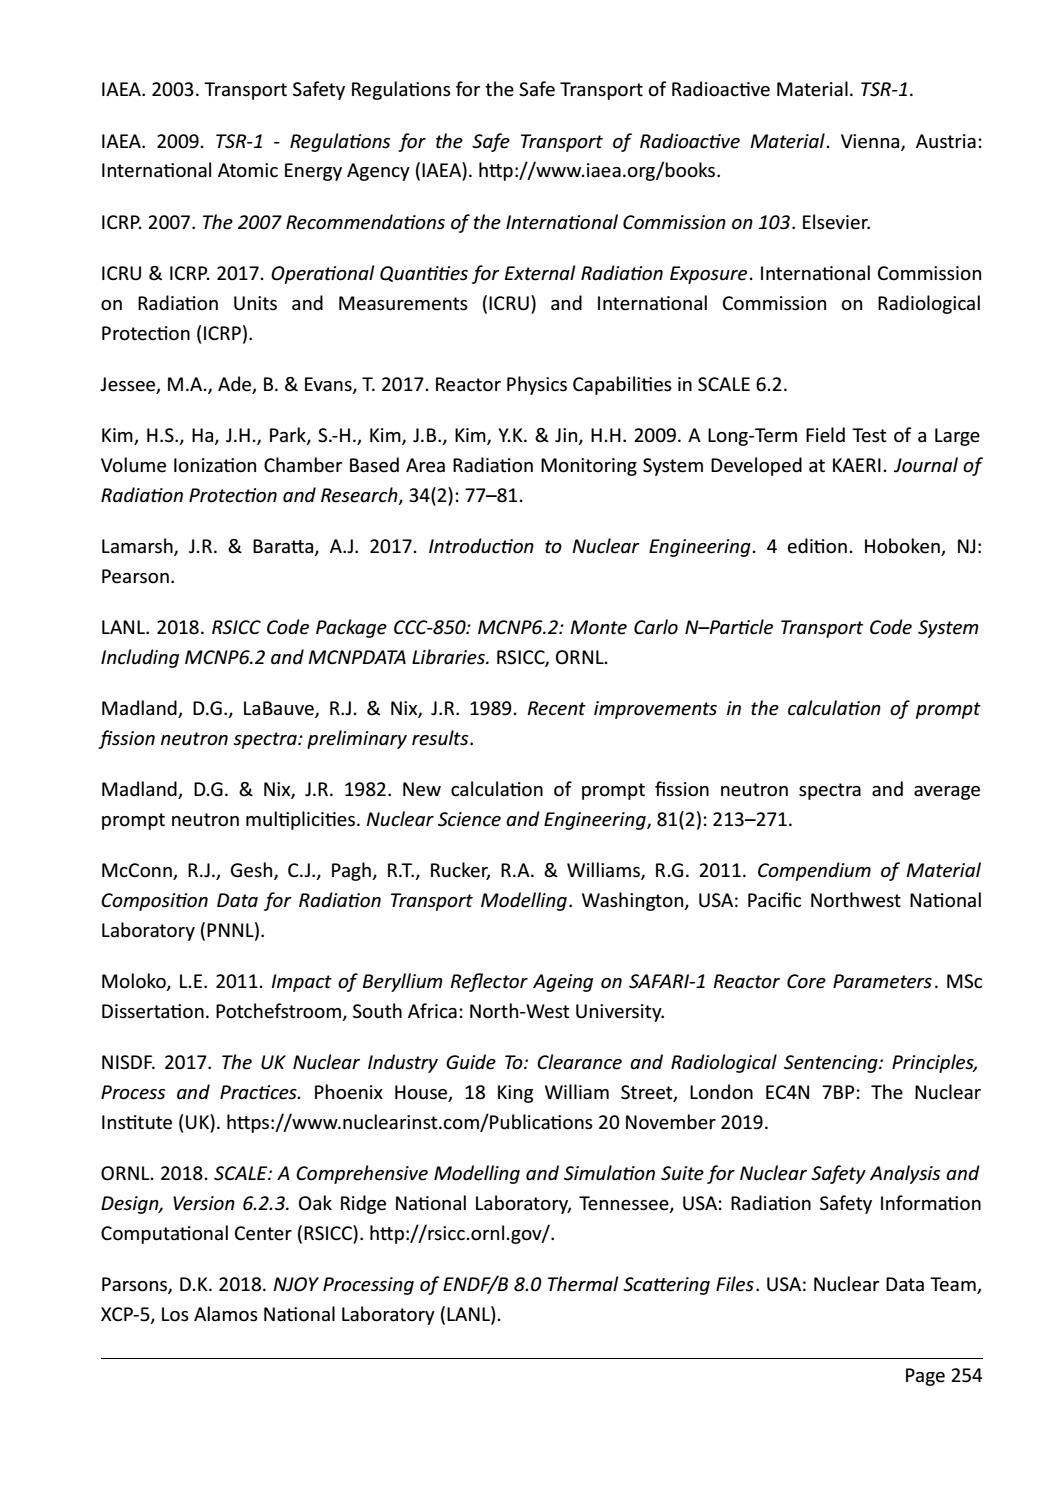 RADIOACTIVE WASTE: COMPUTATIONAL CHARACTERISATION and SHIELDING page 279